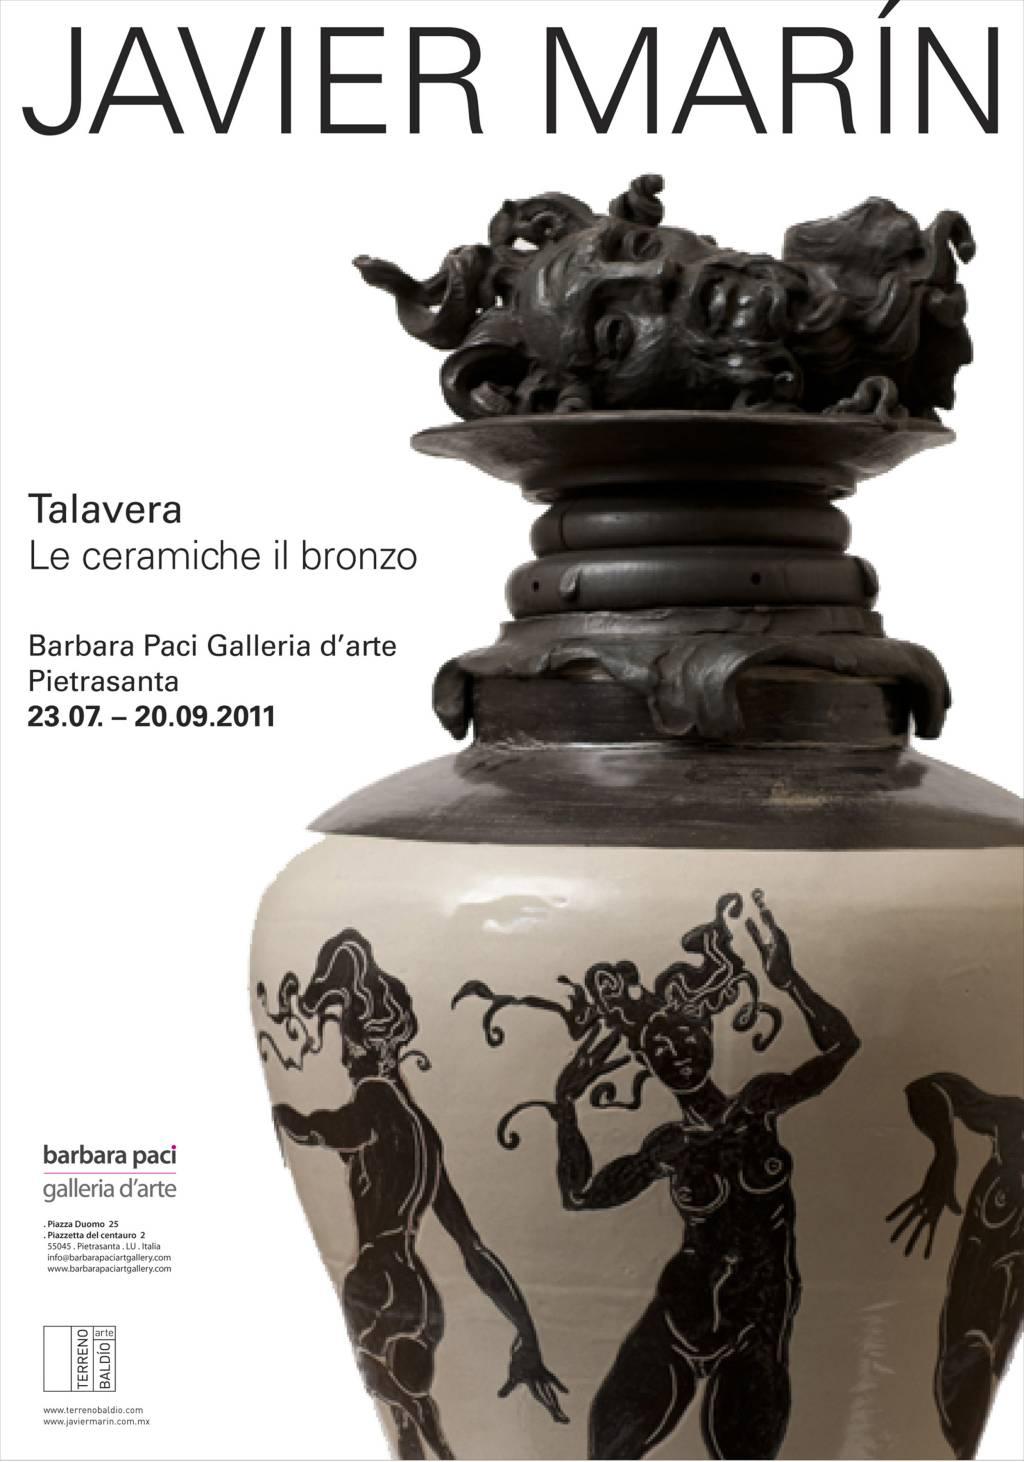 Javier Marìn - Talavera - Barbara Paci Galleria d